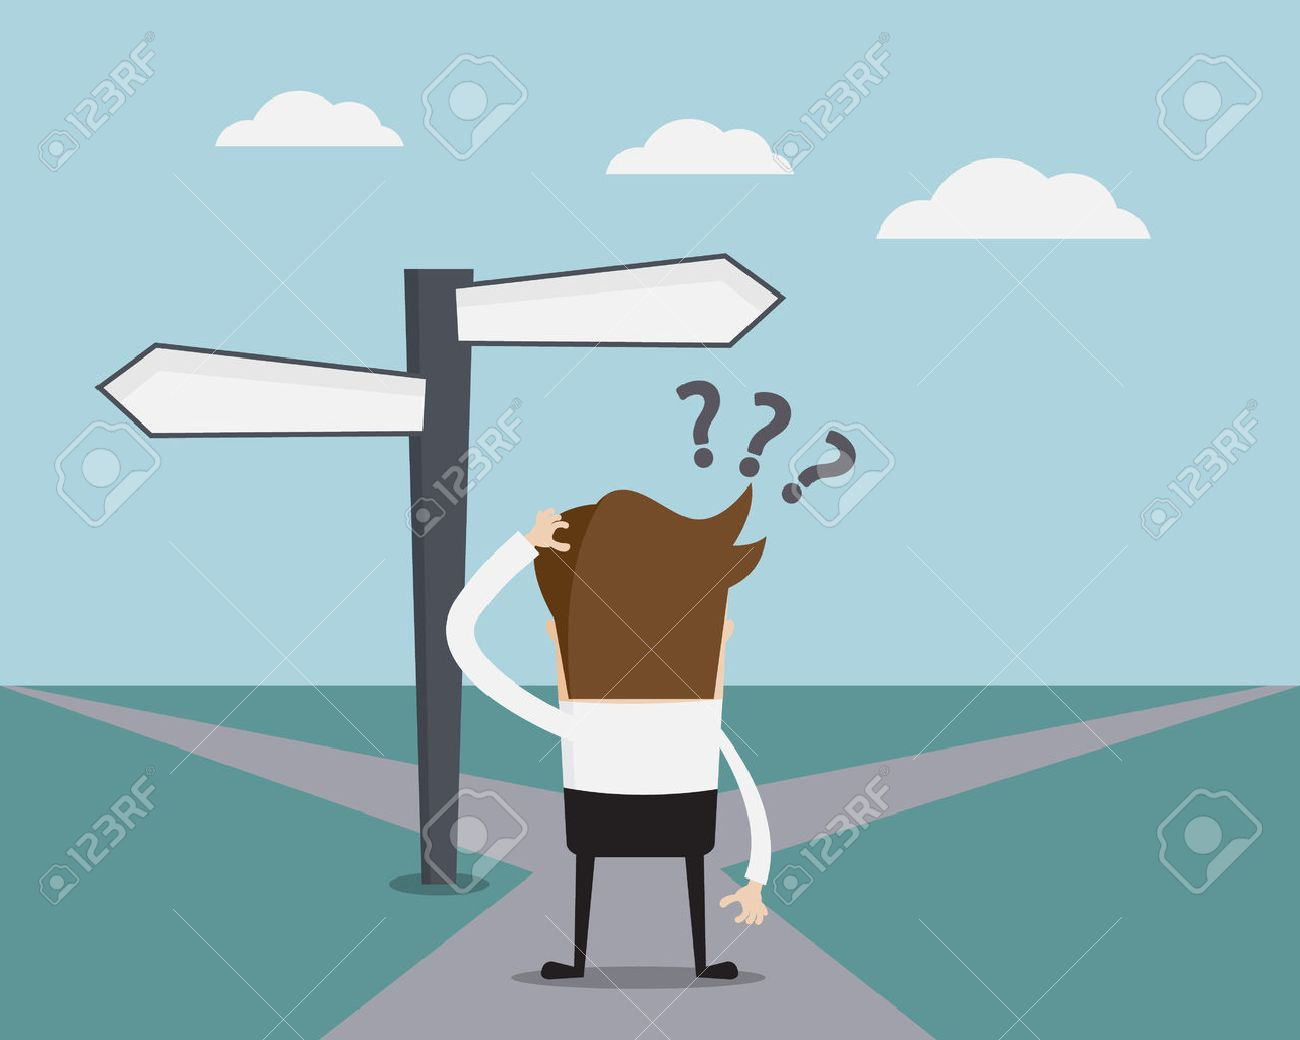 Business Concept, Businessman Confused On Crossroad Cartoon Vector Illustration - 44254766